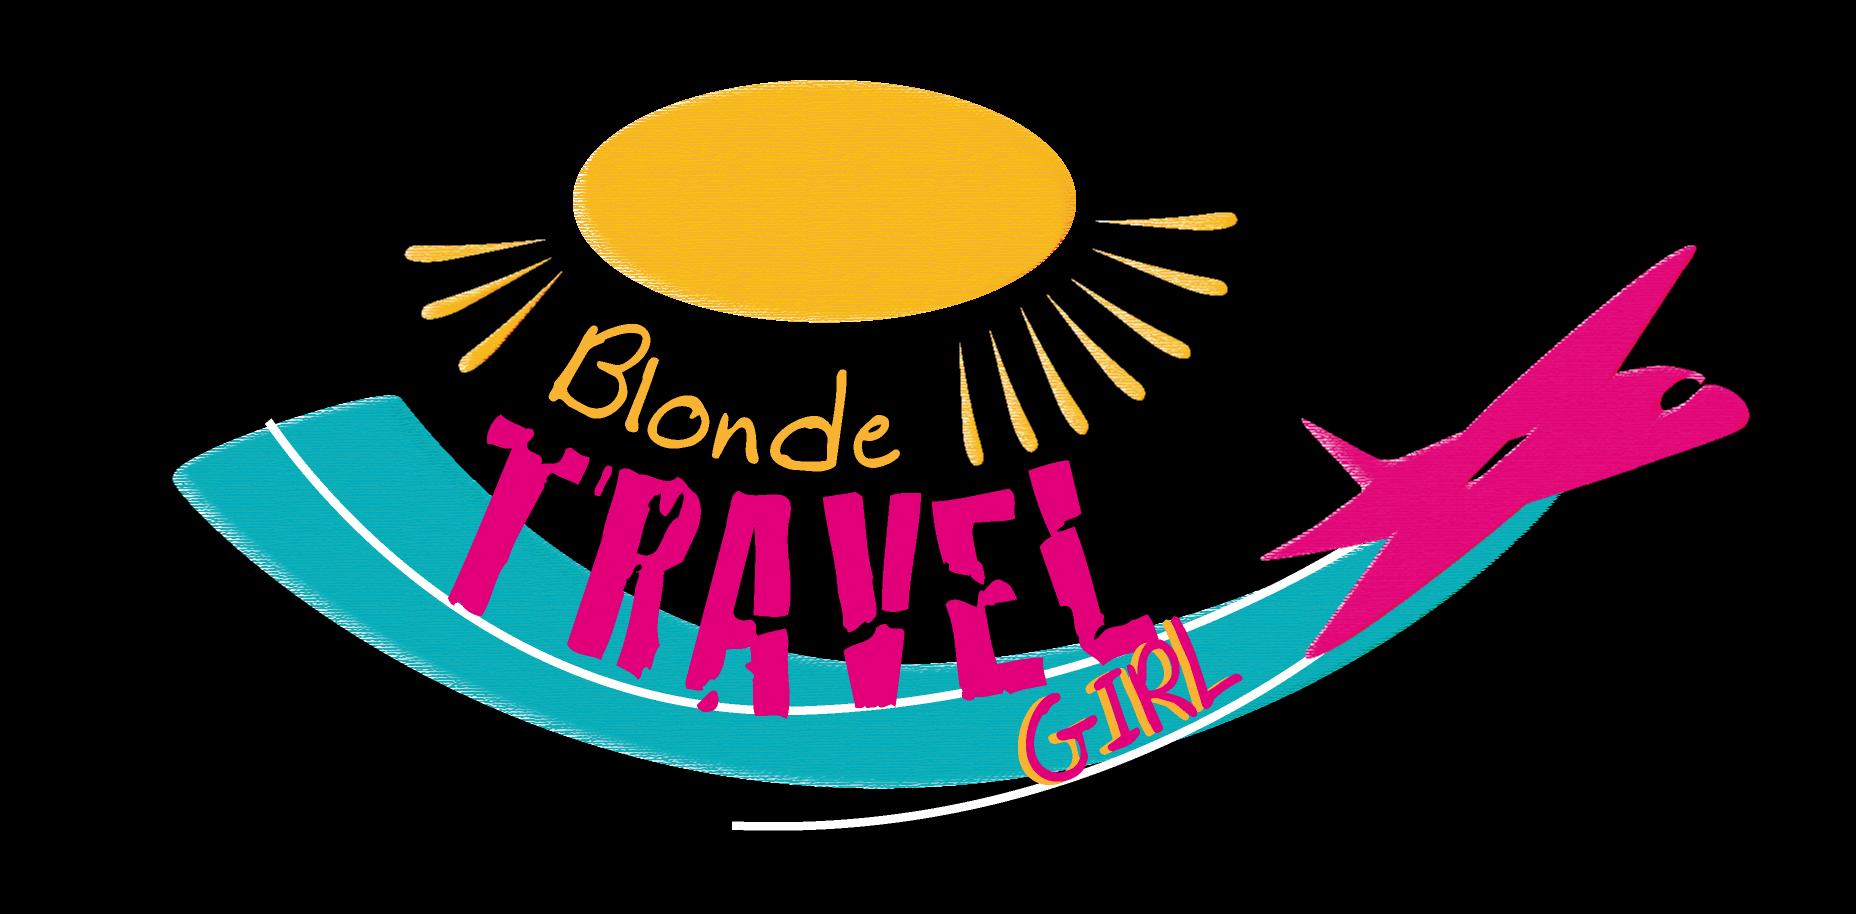 BlondeTravelGirl Logo